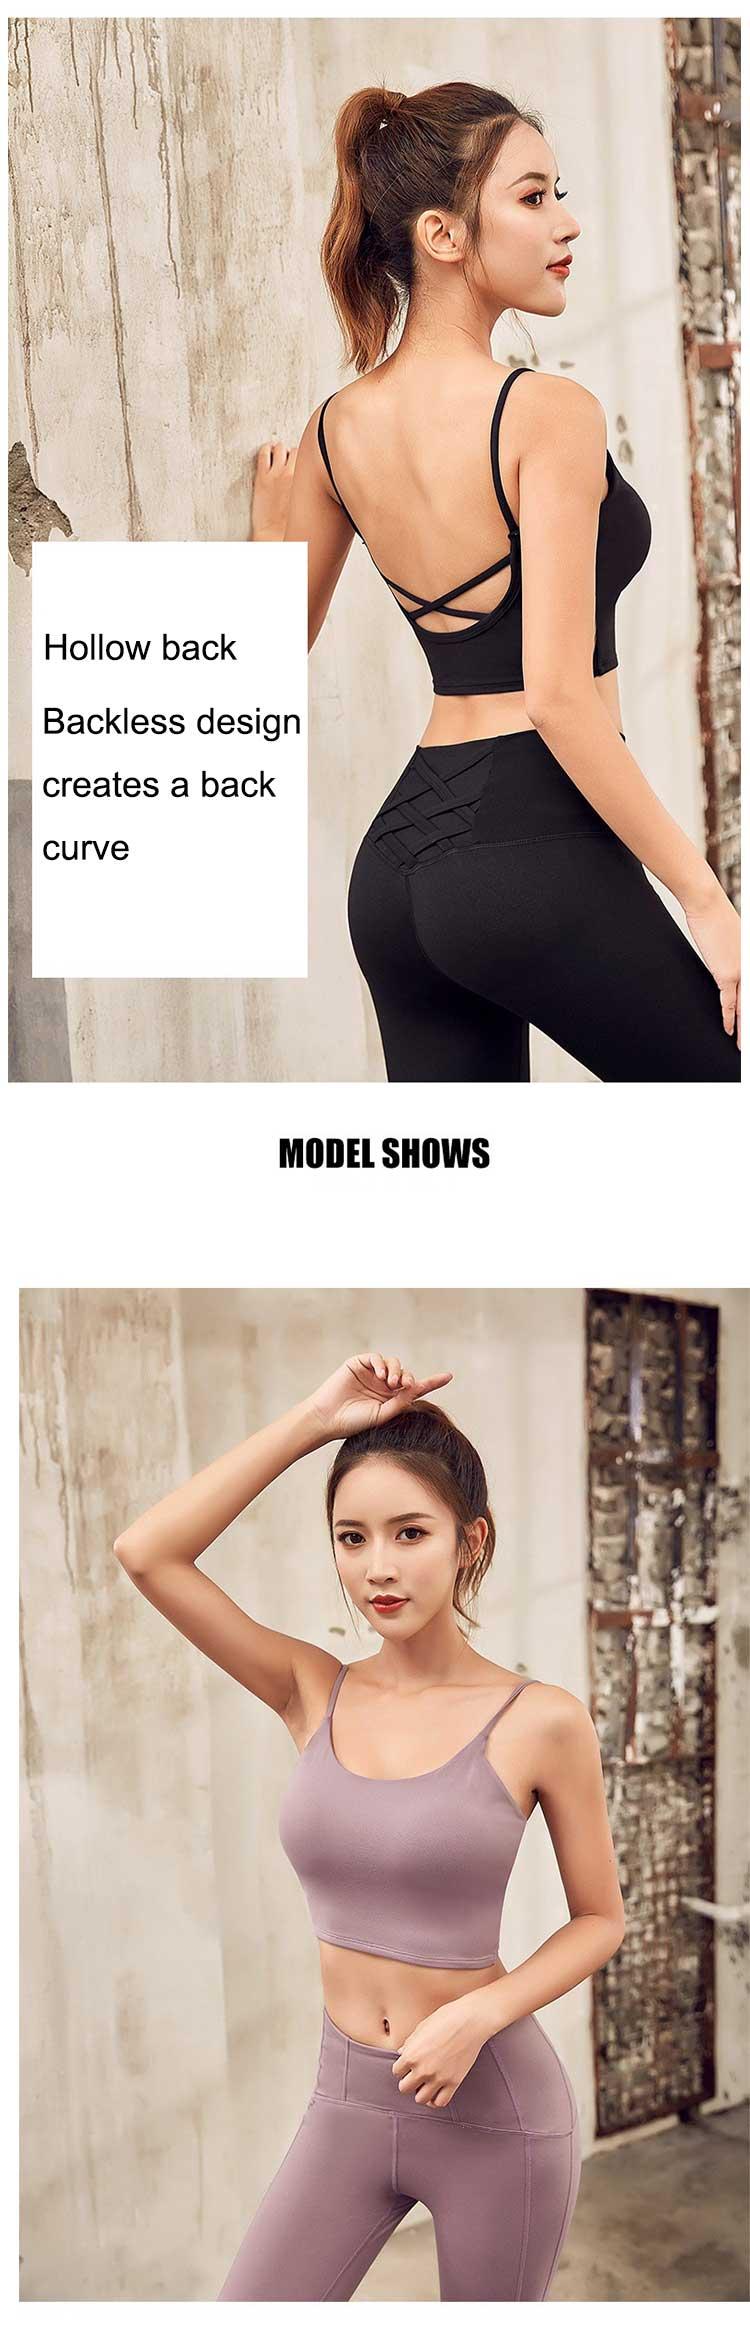 strappy-back-sports-bra-skin-close-contact-is-no-burden